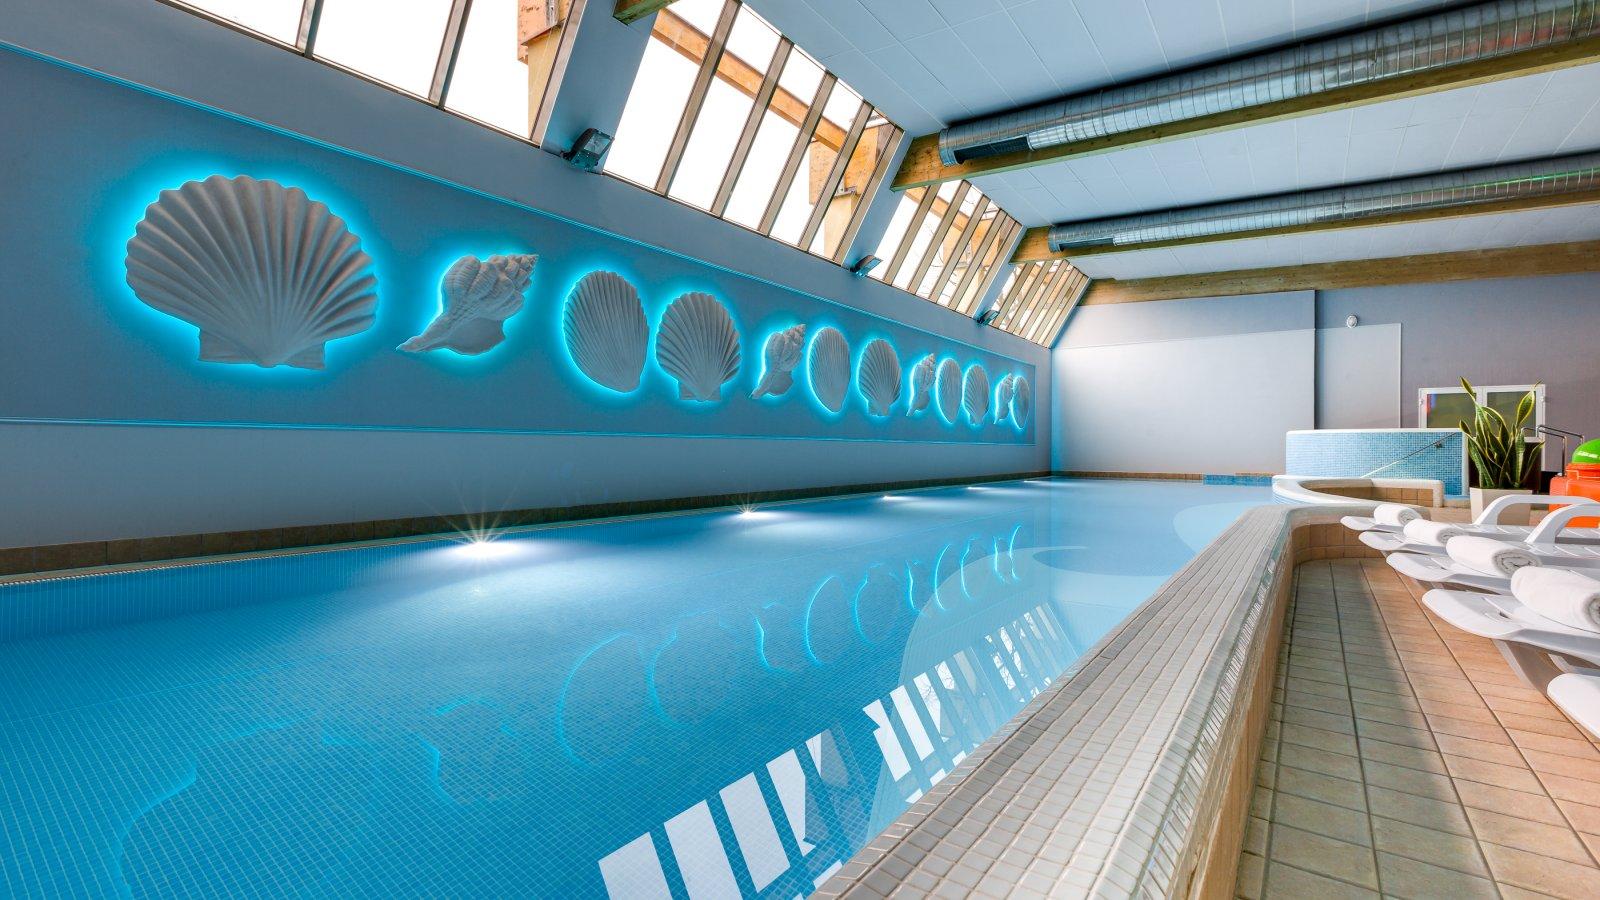 Hotell Aurora pool